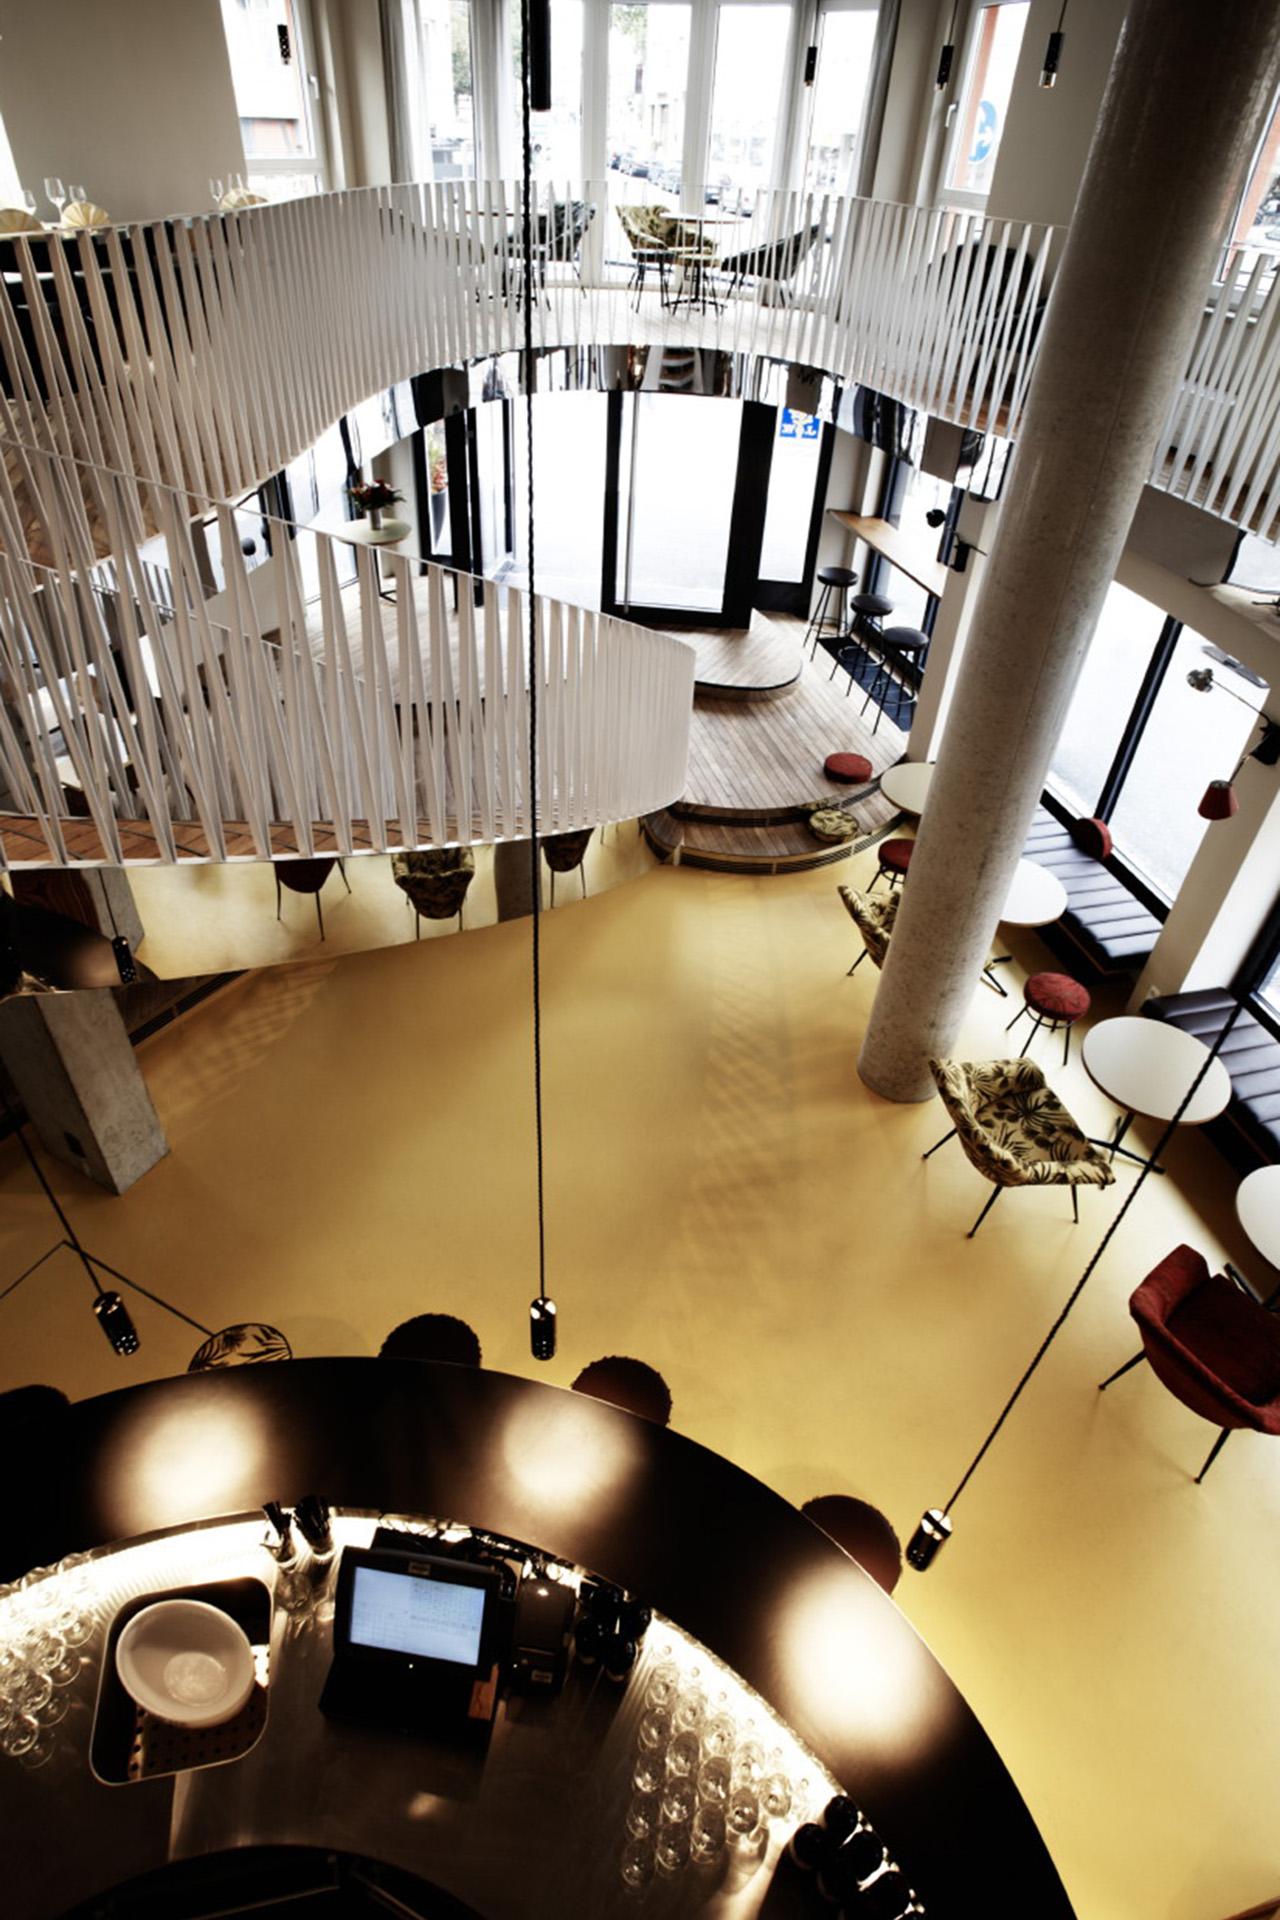 023-interior-design-hospitality-cafe-restaurant-glockenbach-muenchen-buero-philipp-moeller.jpg